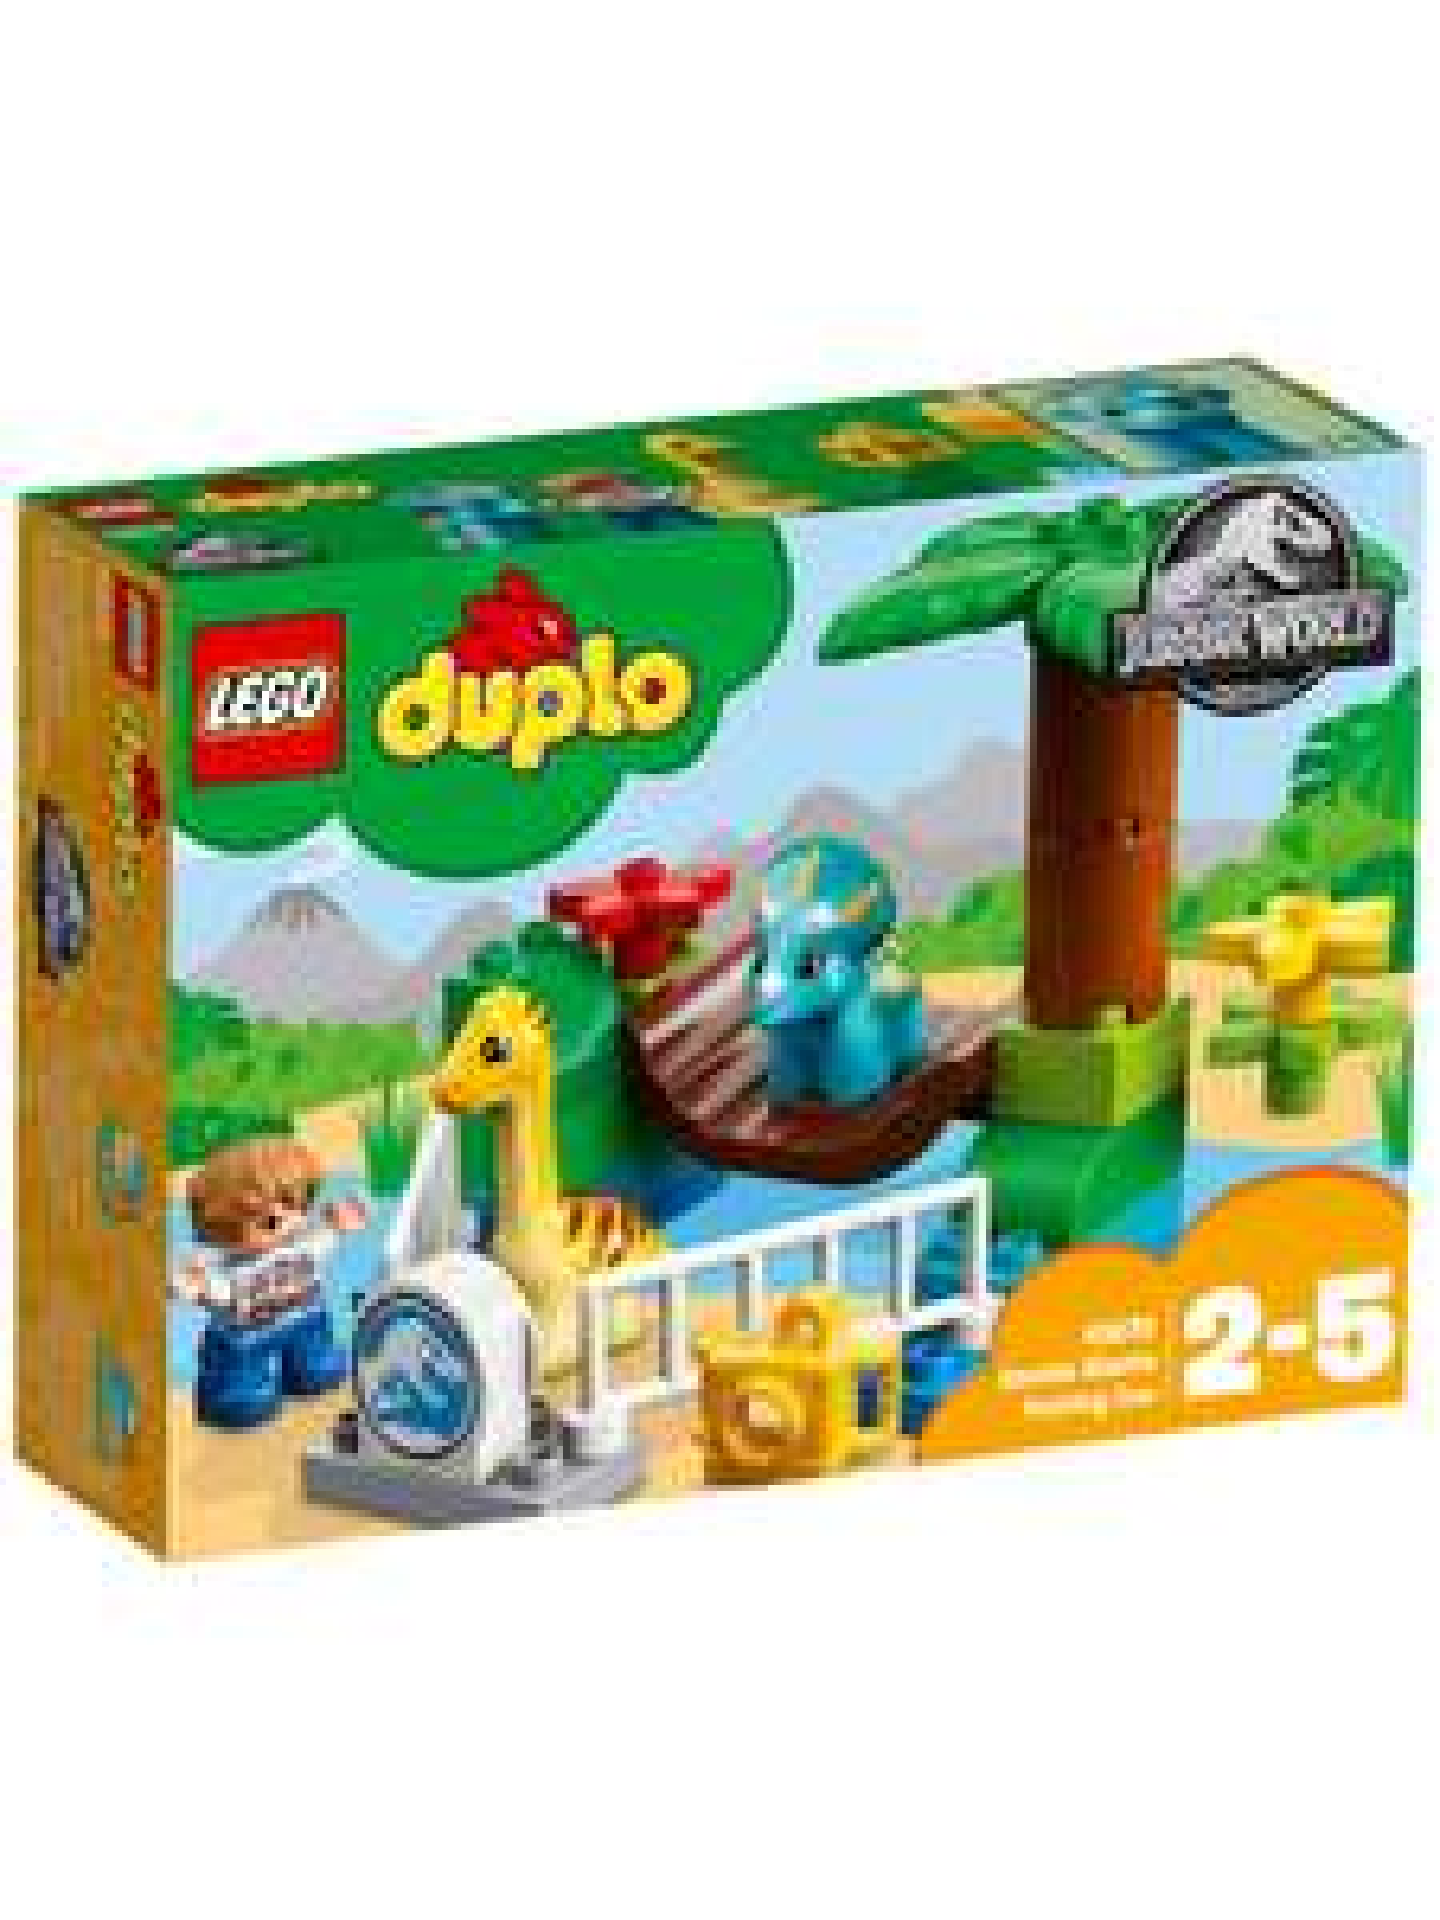 Lego Duplo Deals Cheap Price Best Sale In Uk Hotukdeals